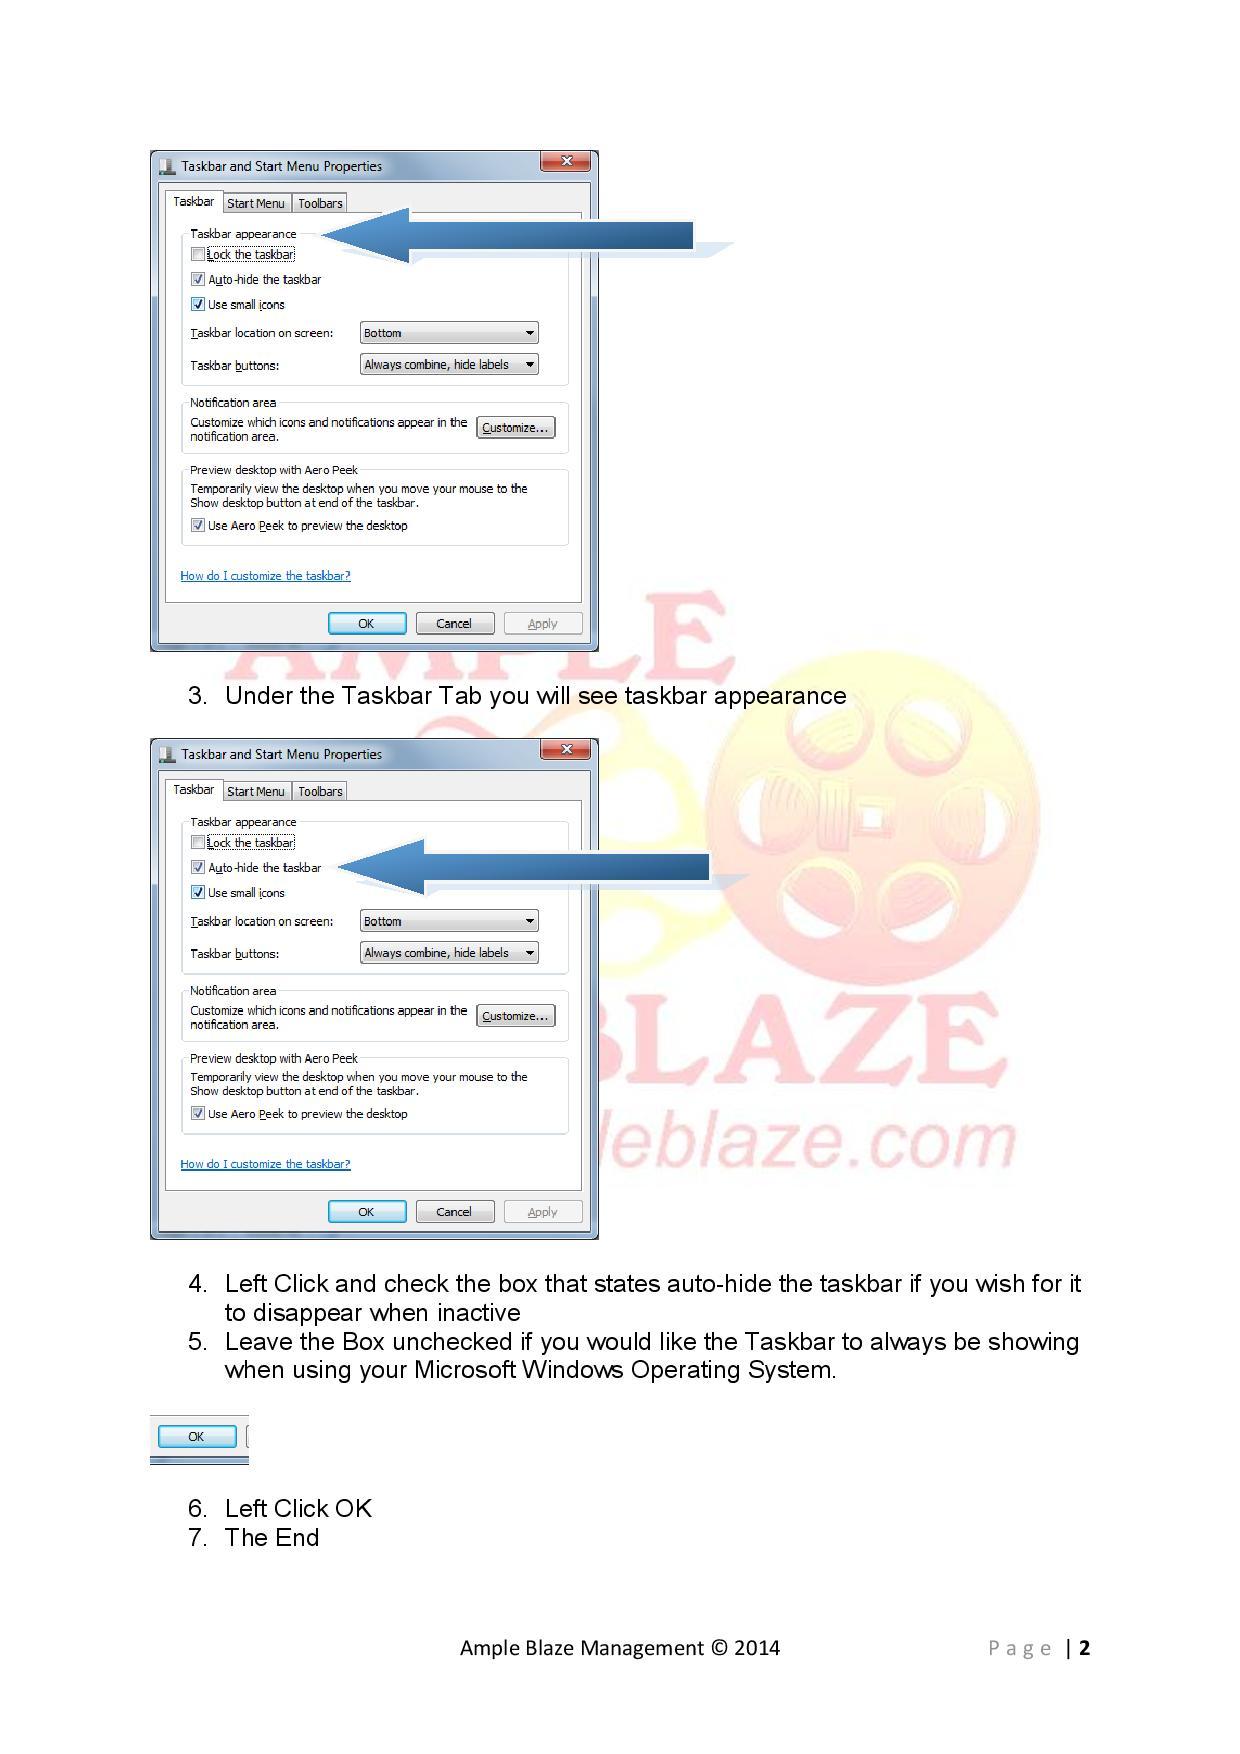 Ample Blaze How to Hide Unhide Taskbar Windows 7-page-002